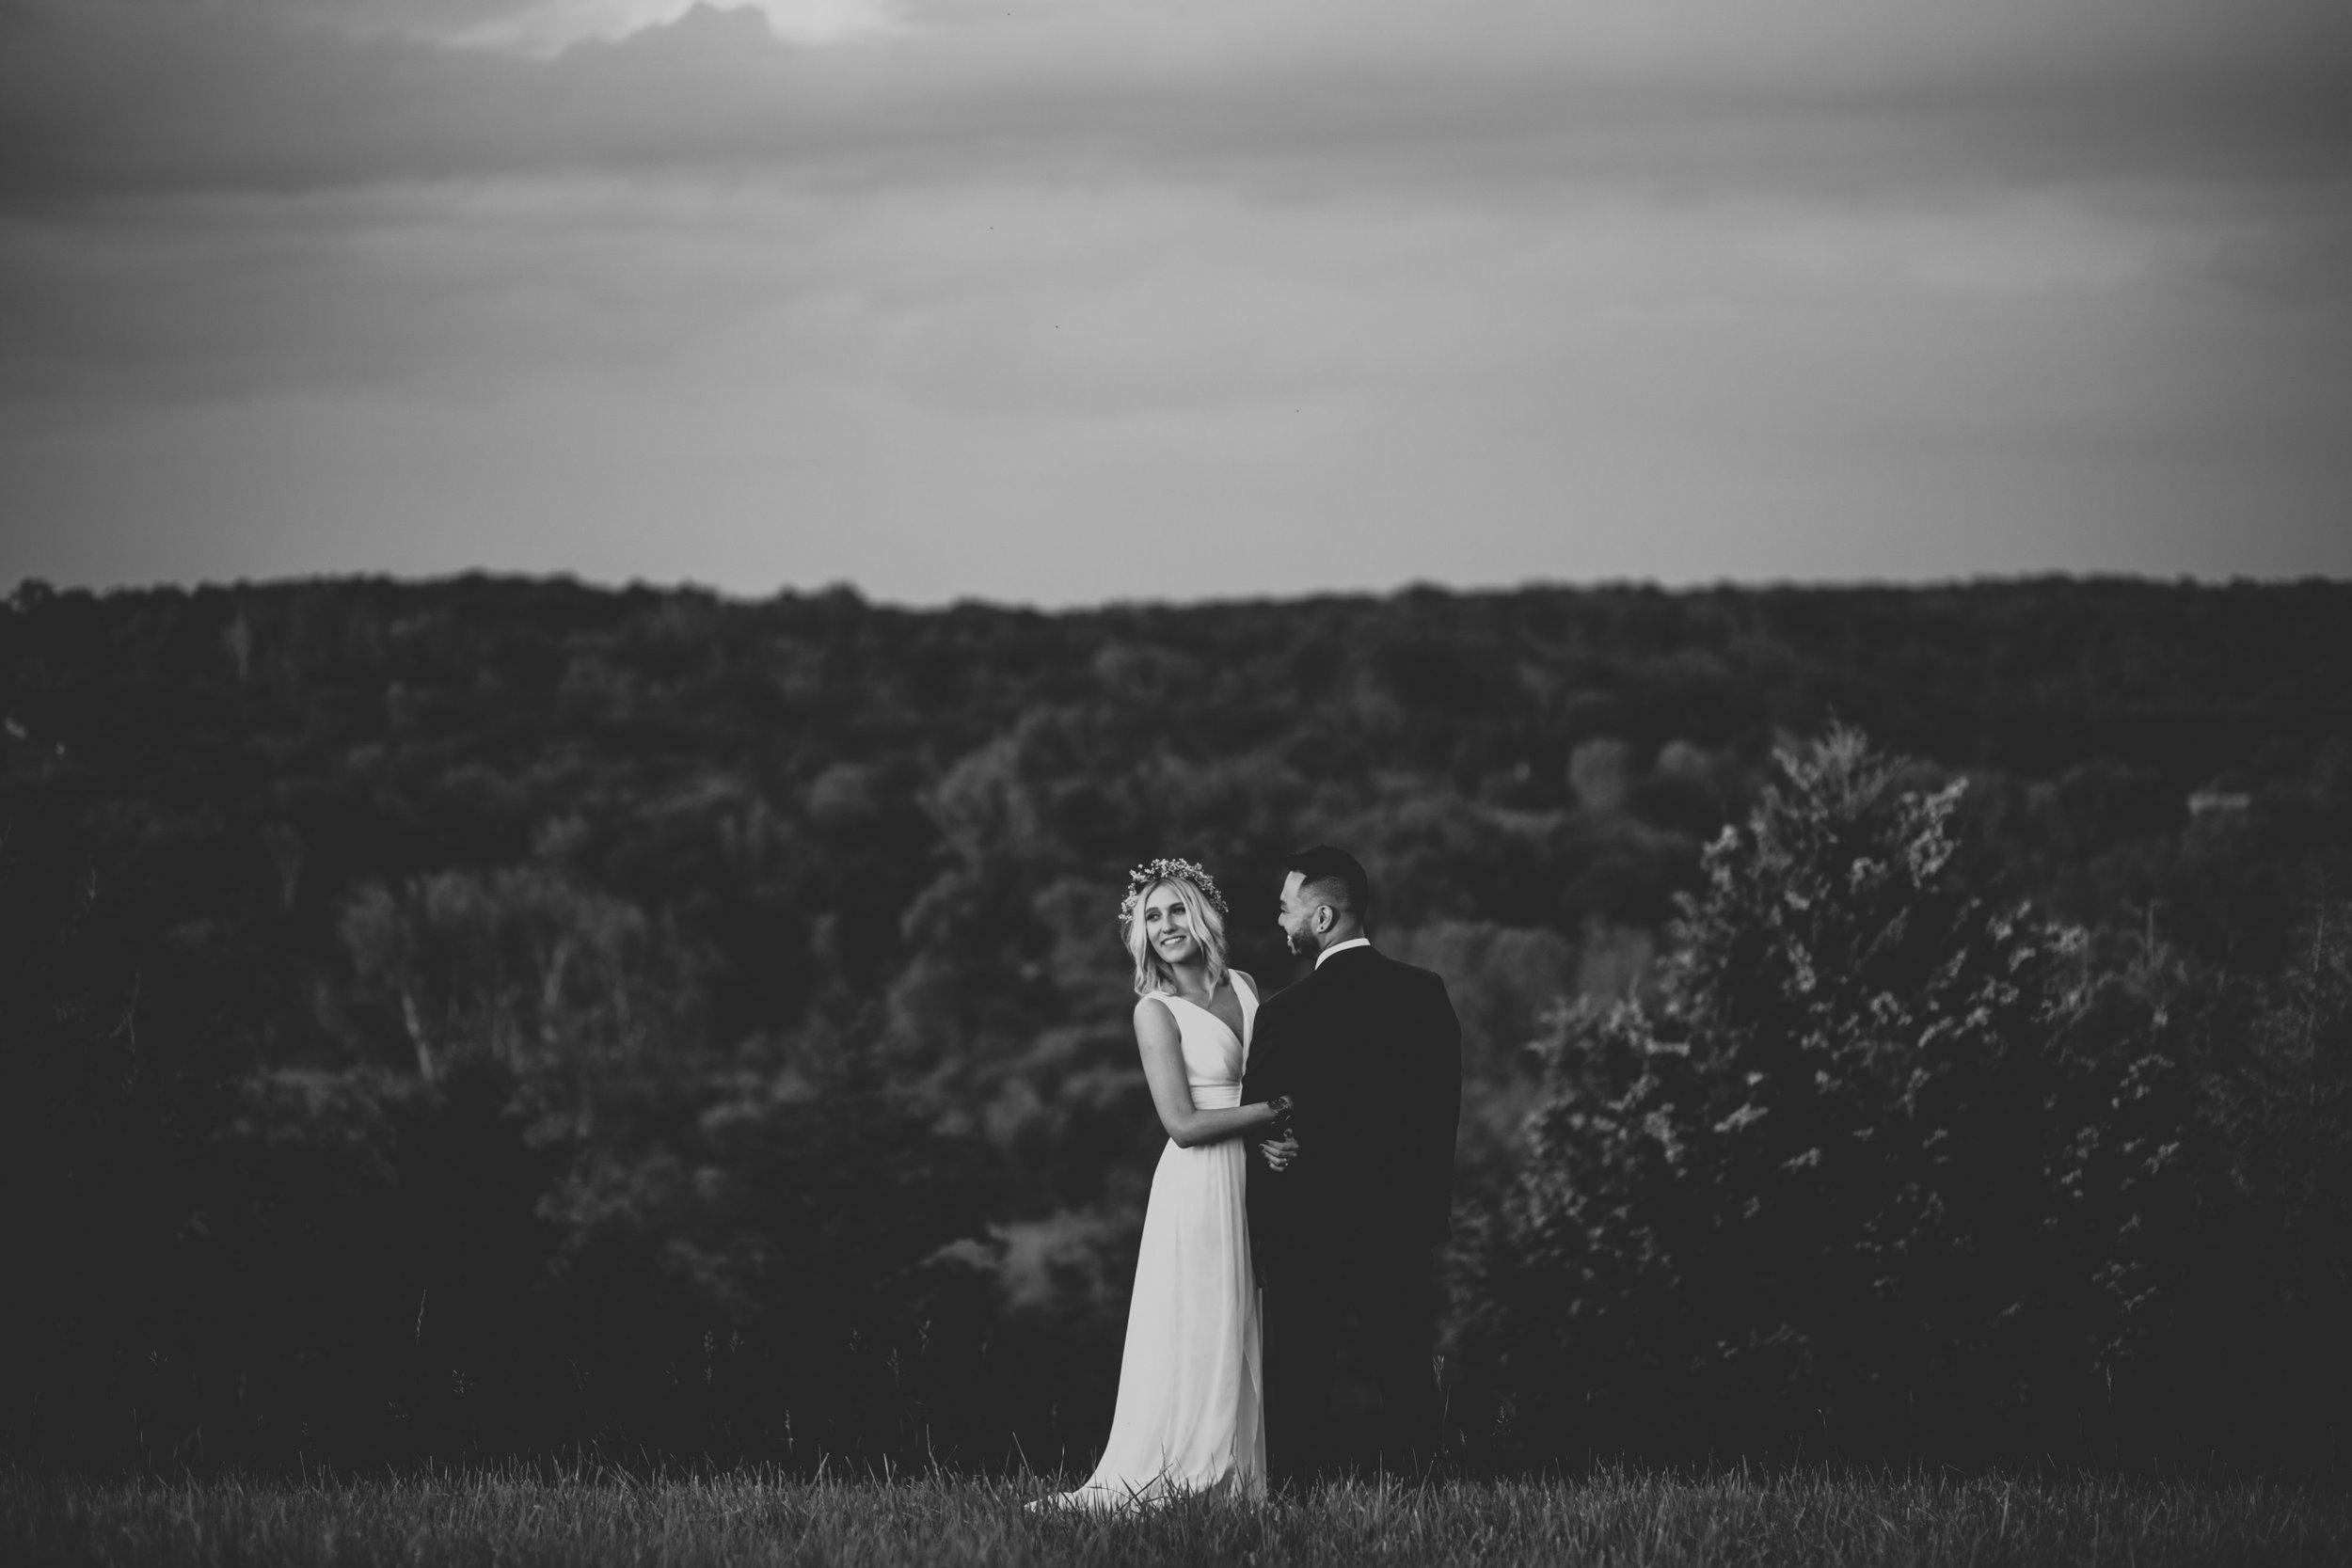 Emily and Zach-Wedding Finals 2-0129.jpg